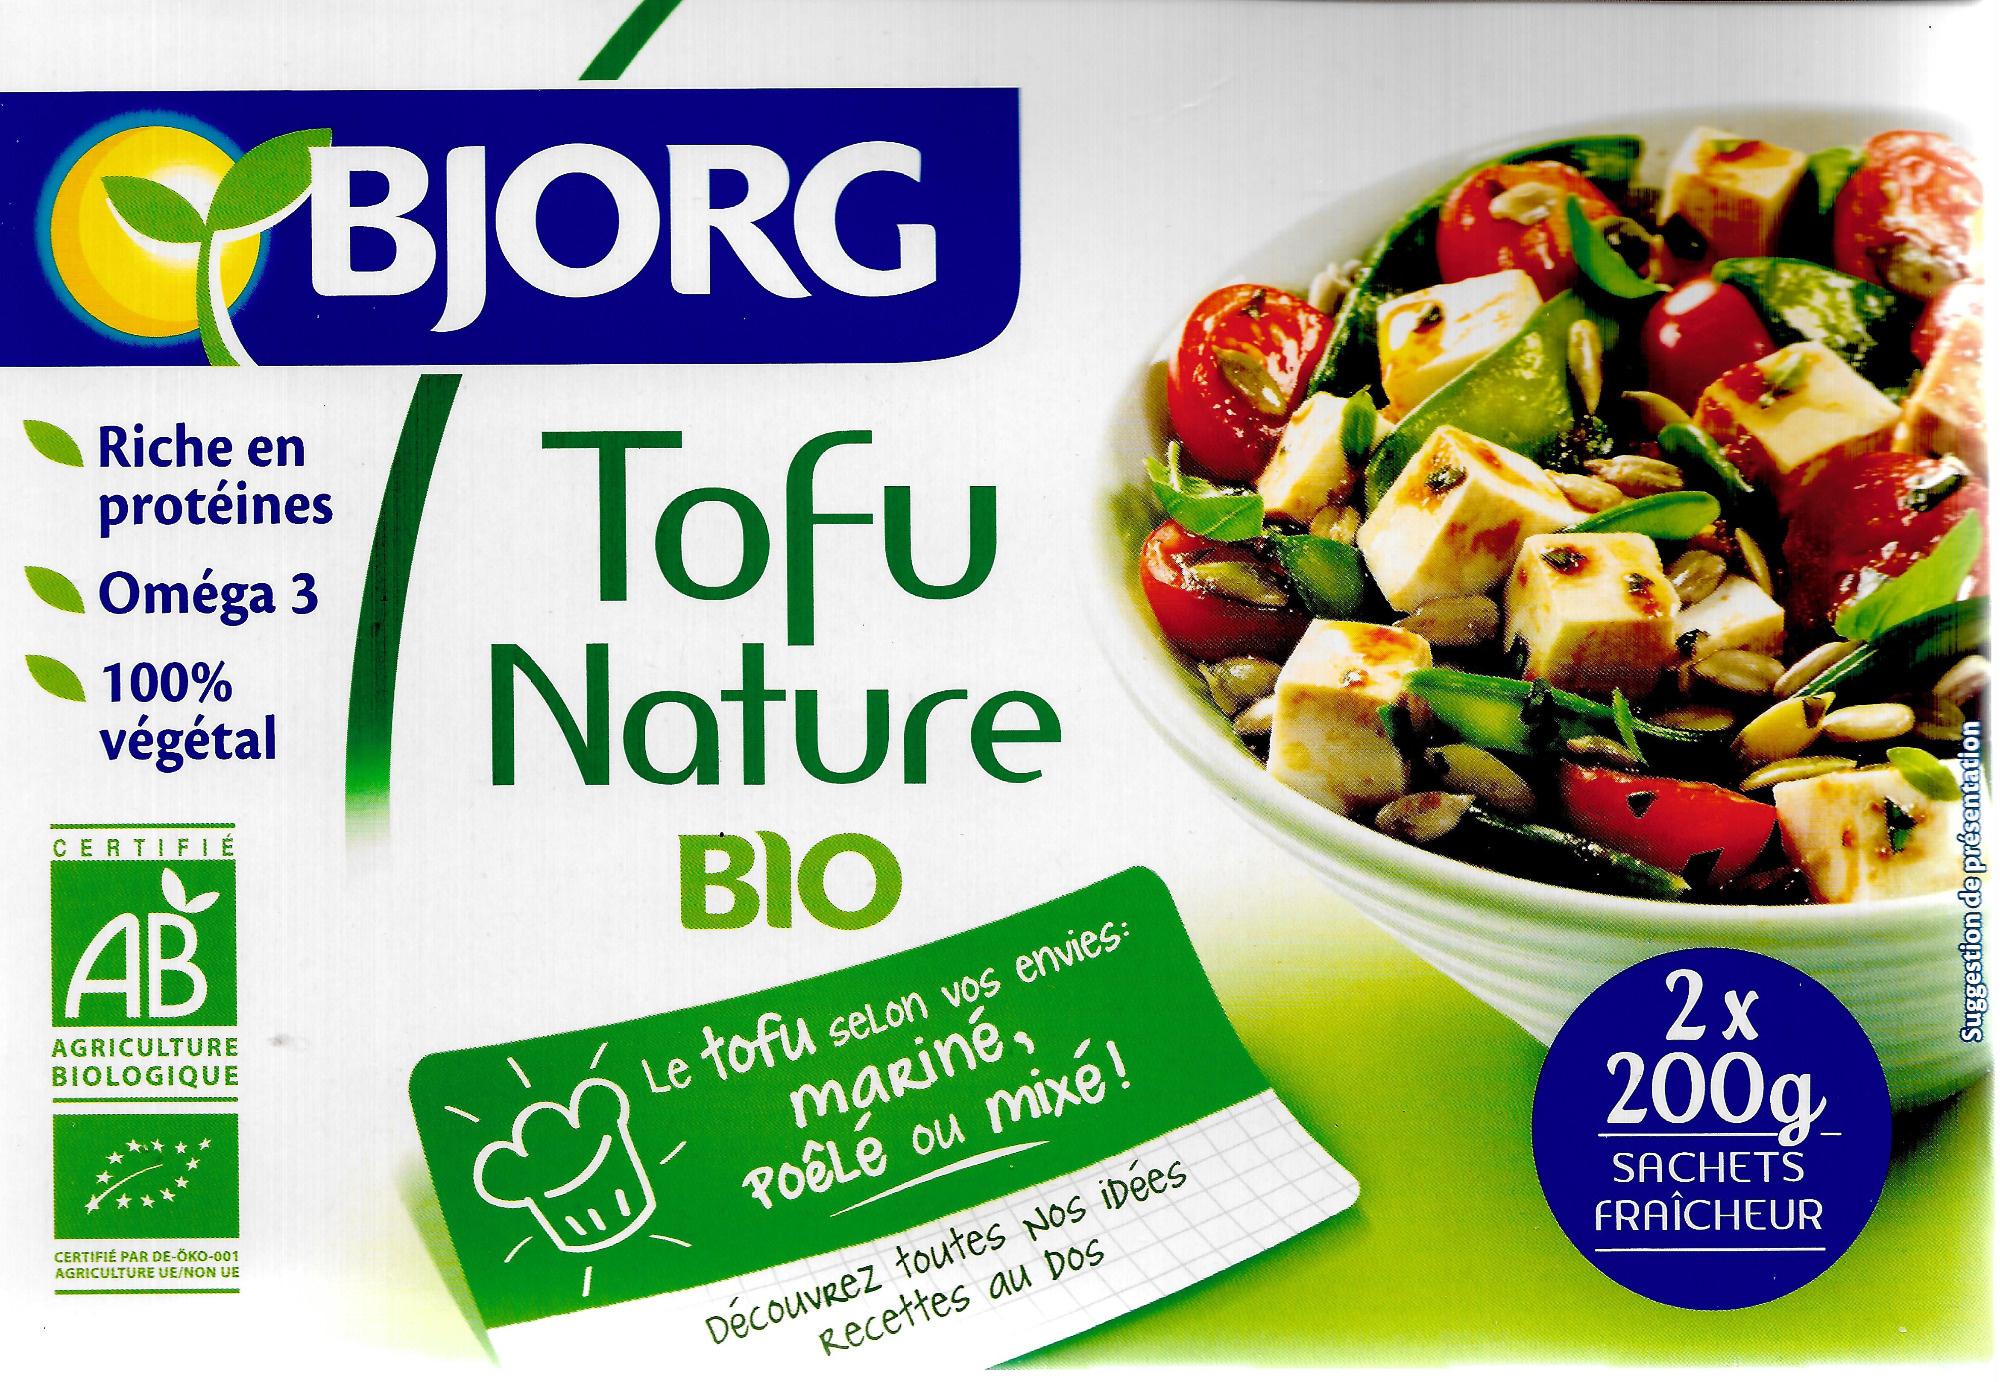 Tofu Nature Sachets fraîcheur - Prodotto